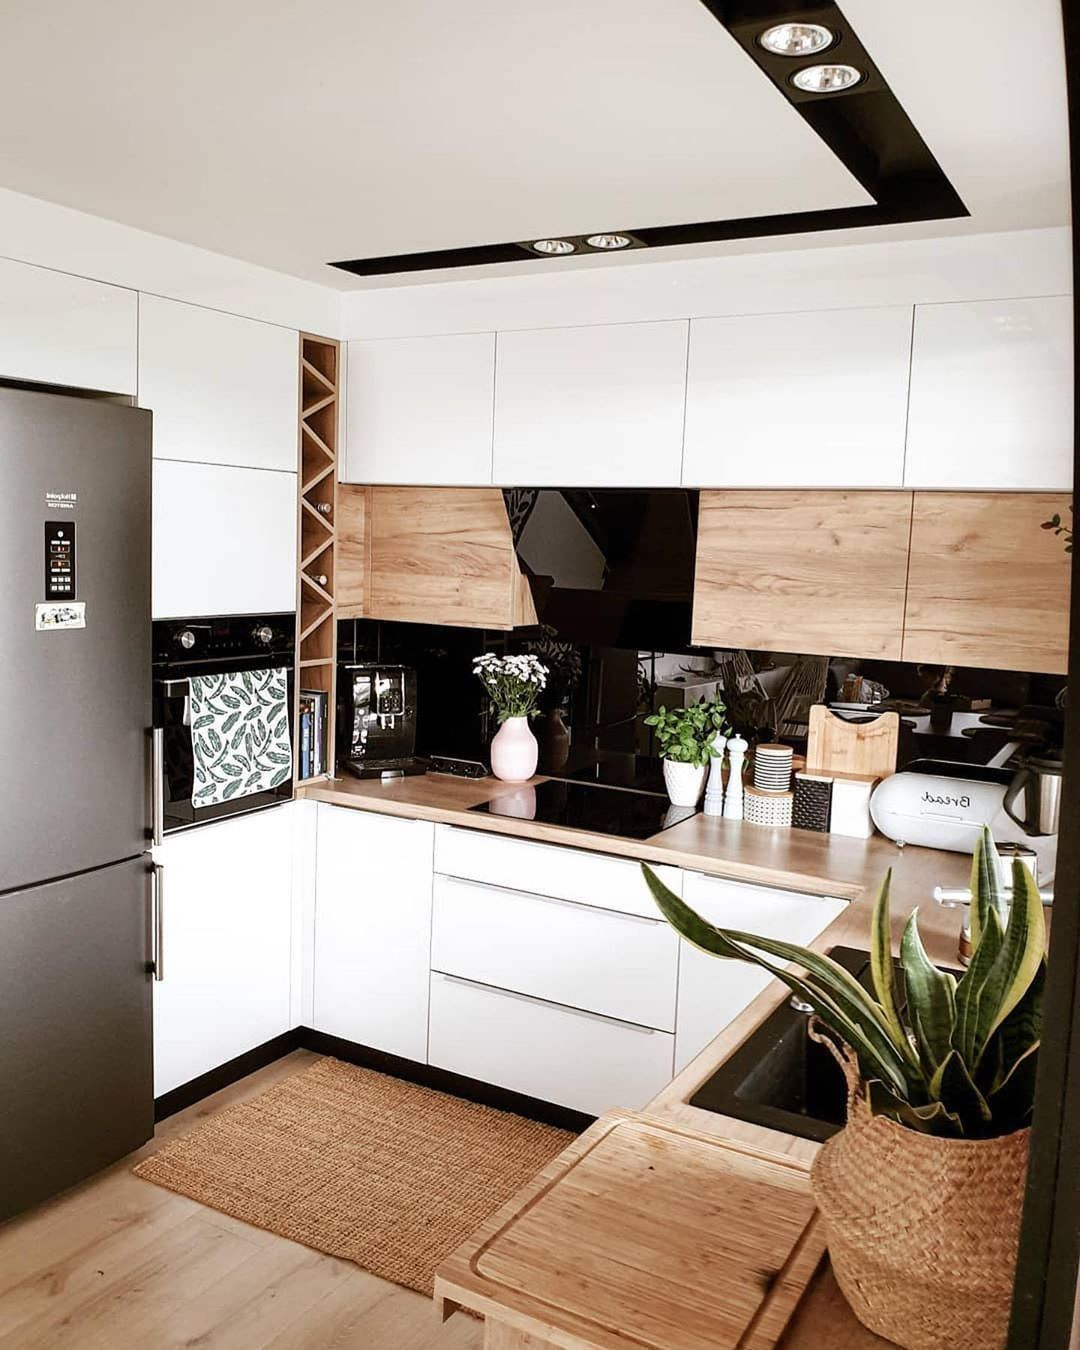 Pin By Zofia Piatek On Kuhnya Kitchen Home Decor Kitchen Modern Kitchen Design Kitchen Design